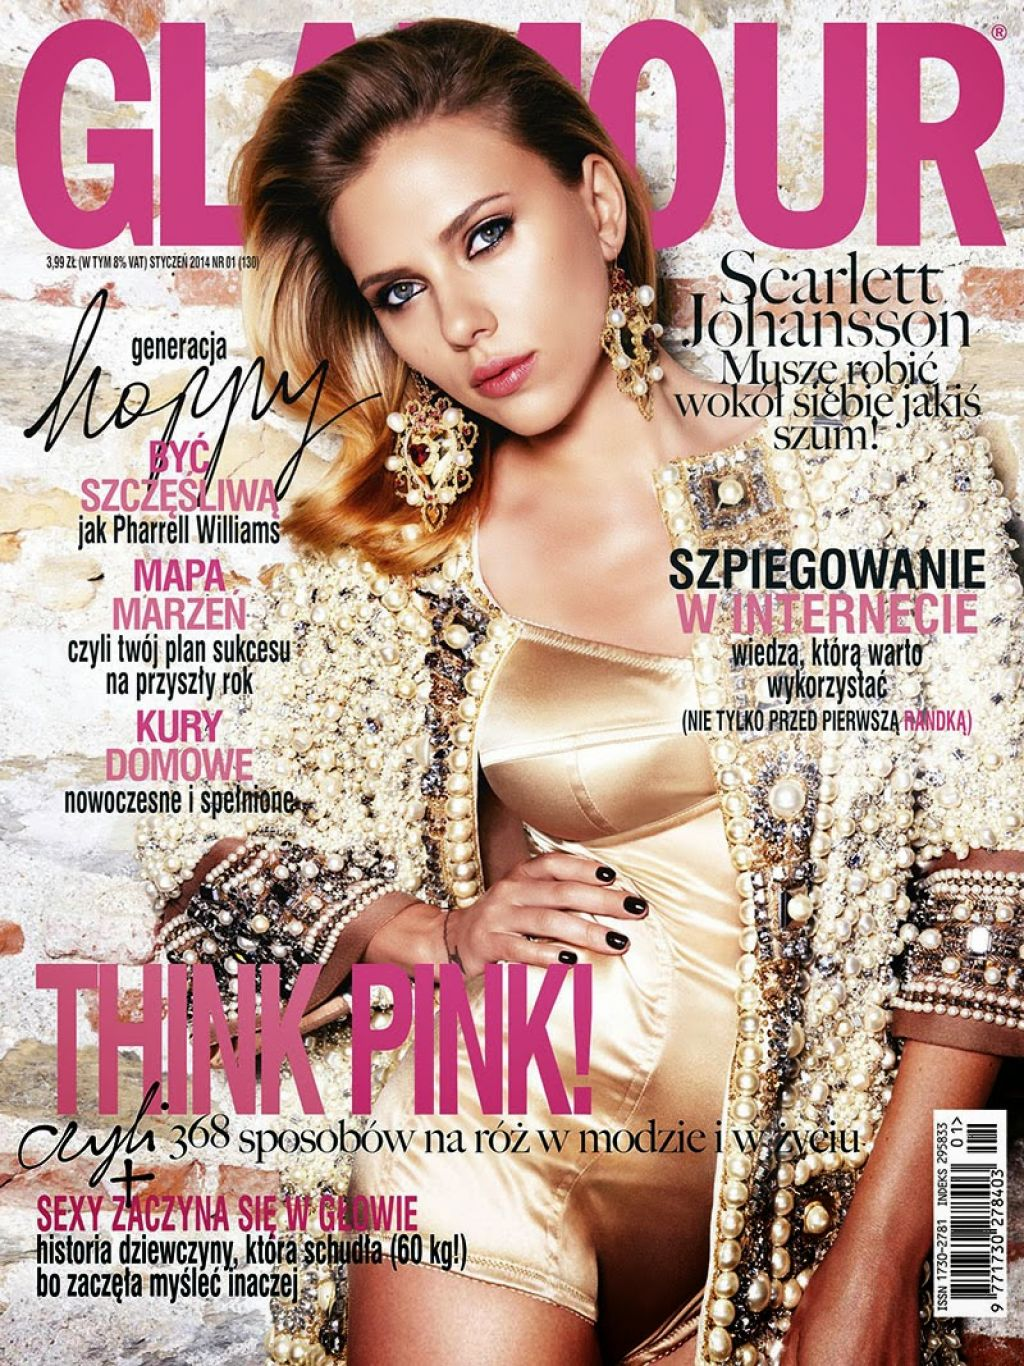 Scarlett Johansson - GLAMOUR Magazine (Poland) - January 2014 Cover